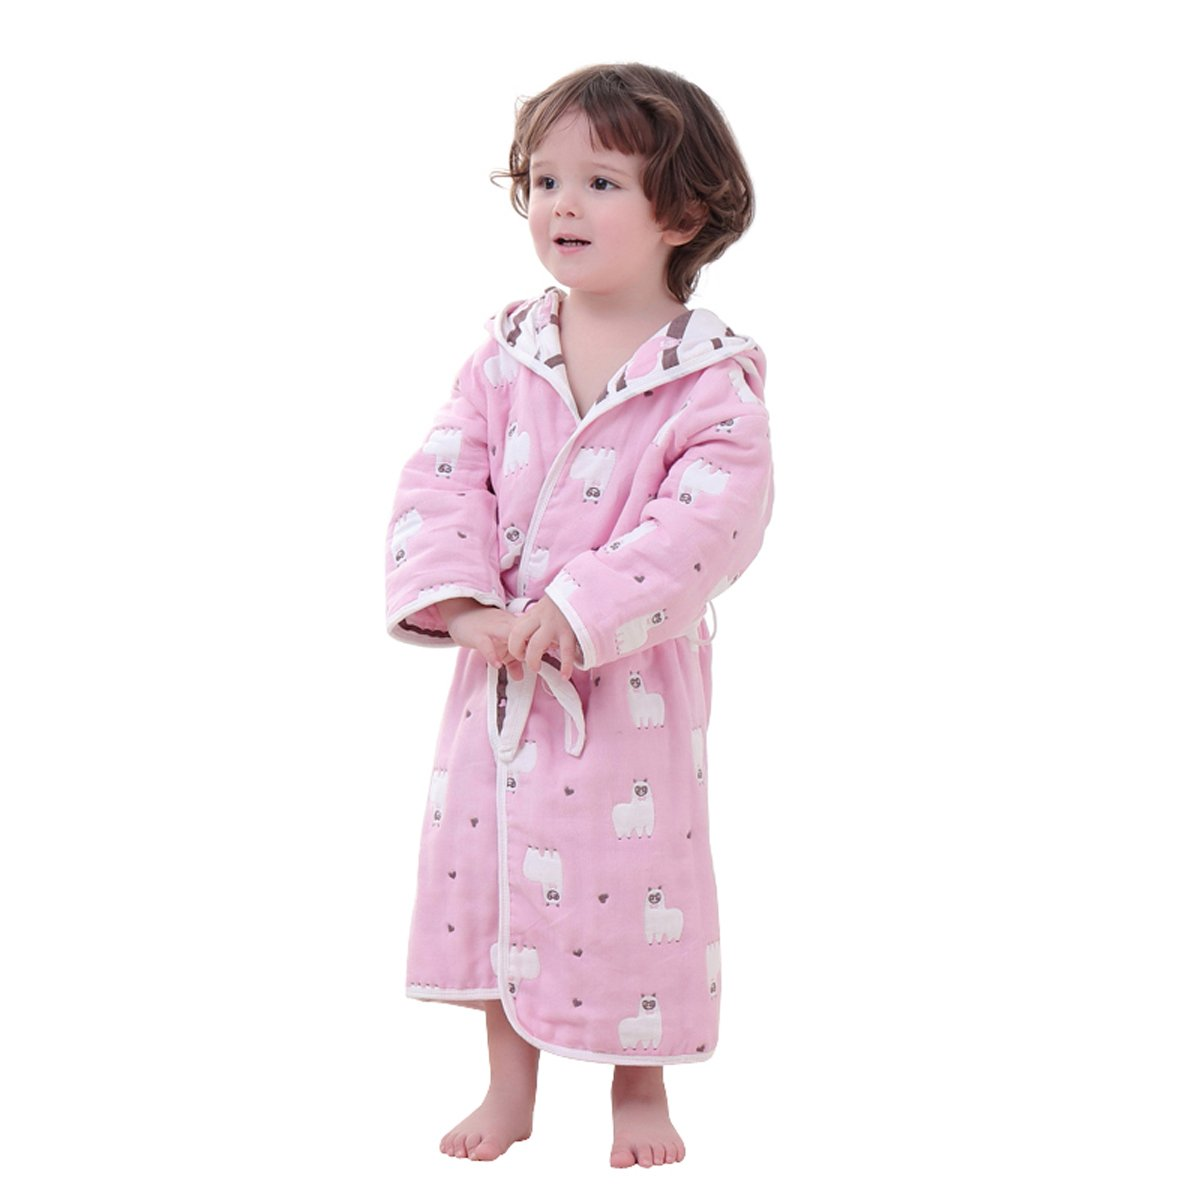 TOLLION 100% Organic Cotton Boys And Girls Hooded Robe Kids Bathrobe Nightgown (S: 5-6 Years, Pink Alpaca)